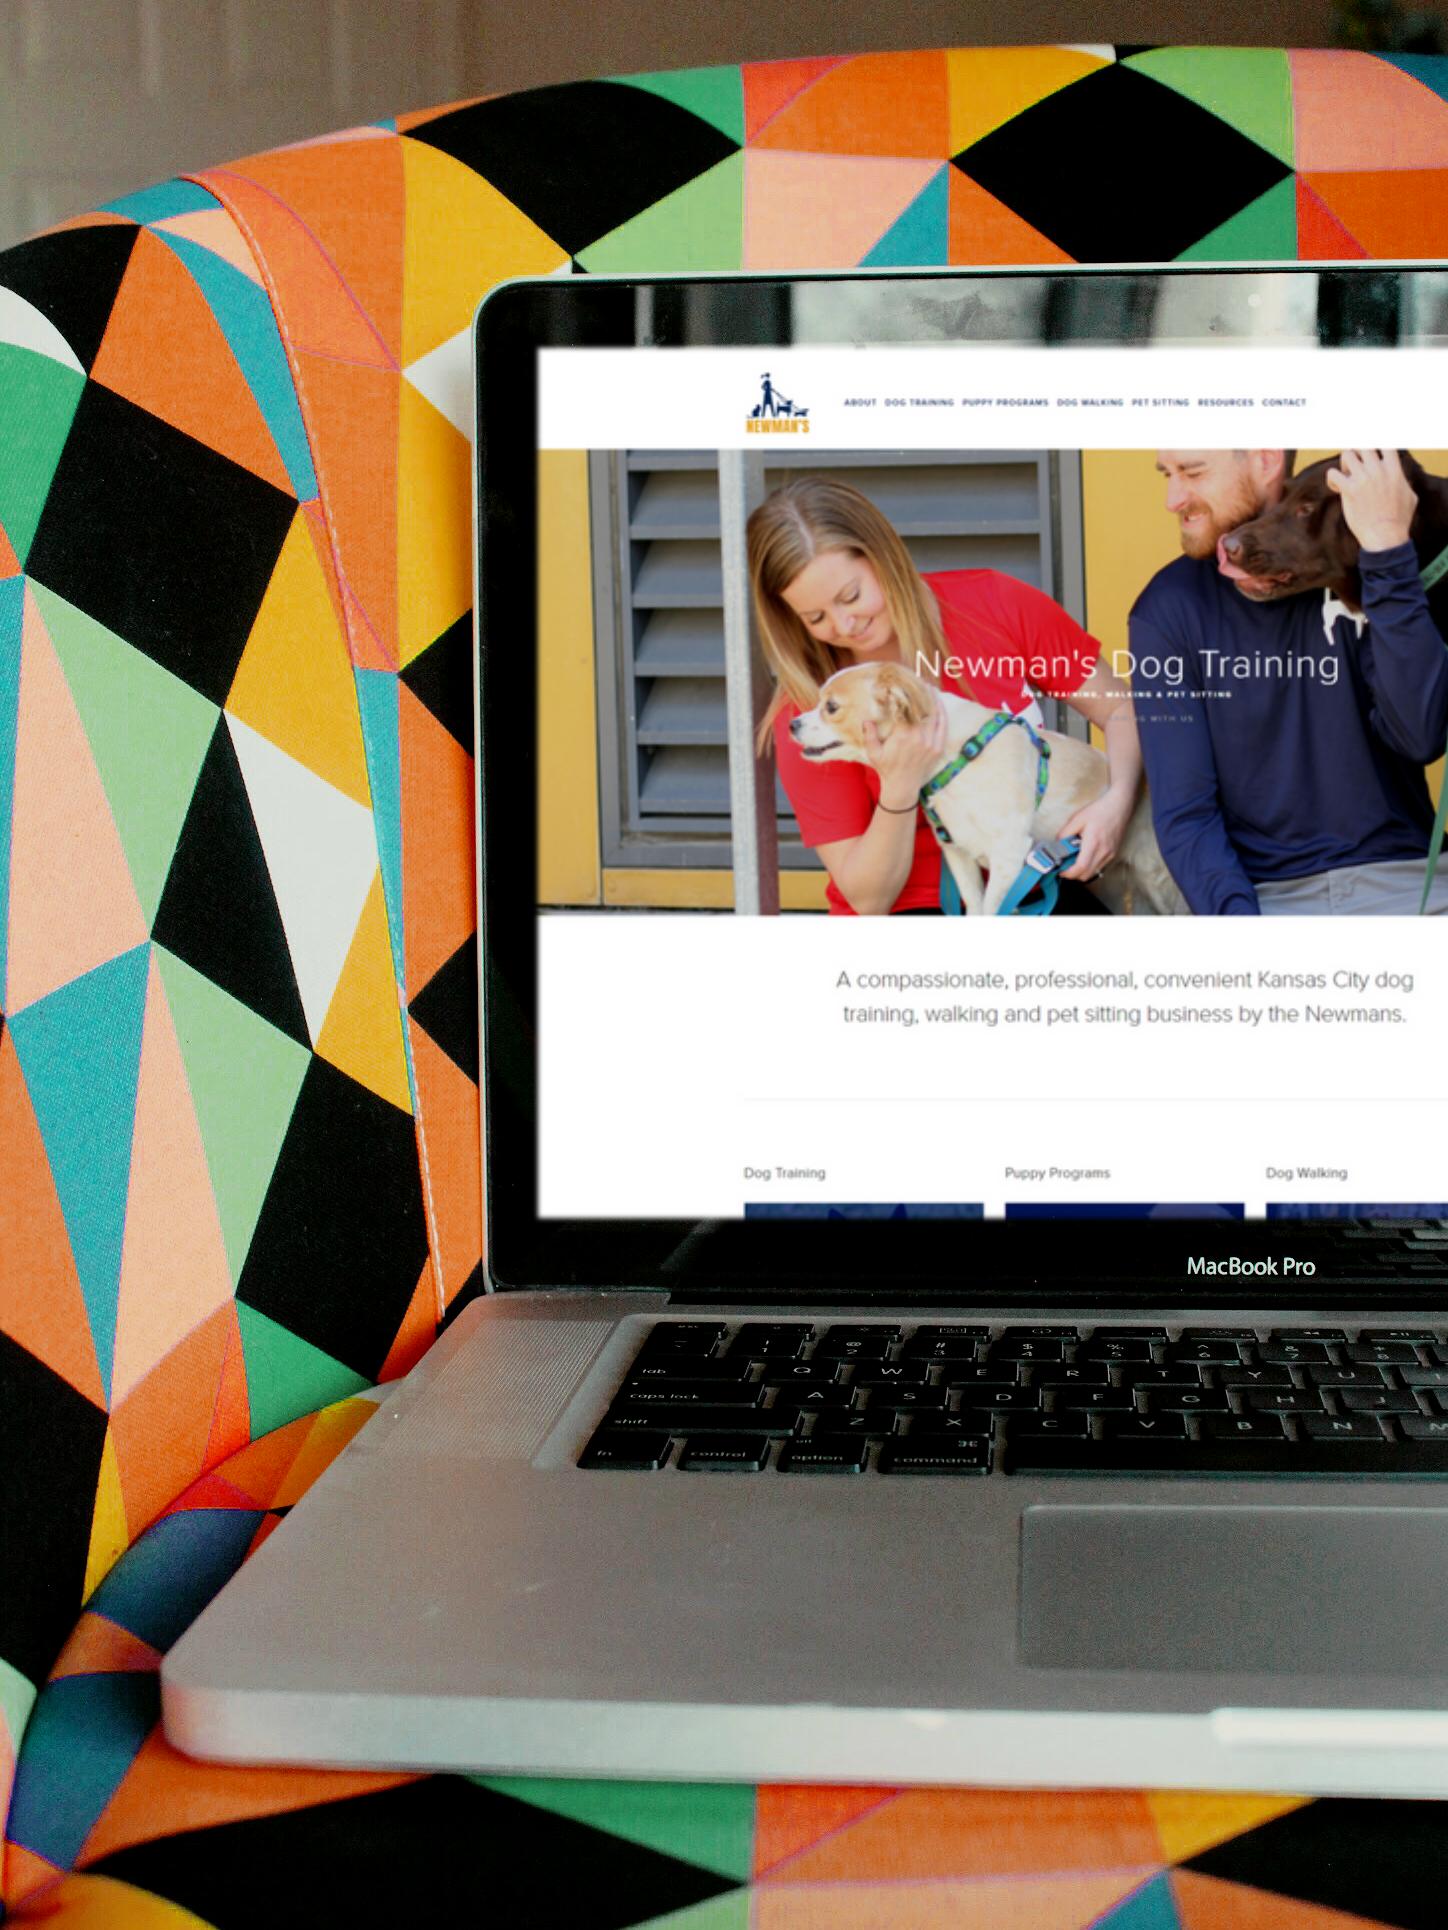 Web Design For Newman S Dog Training Steph Rupp Llc Kc Freelance Web Design And Photography